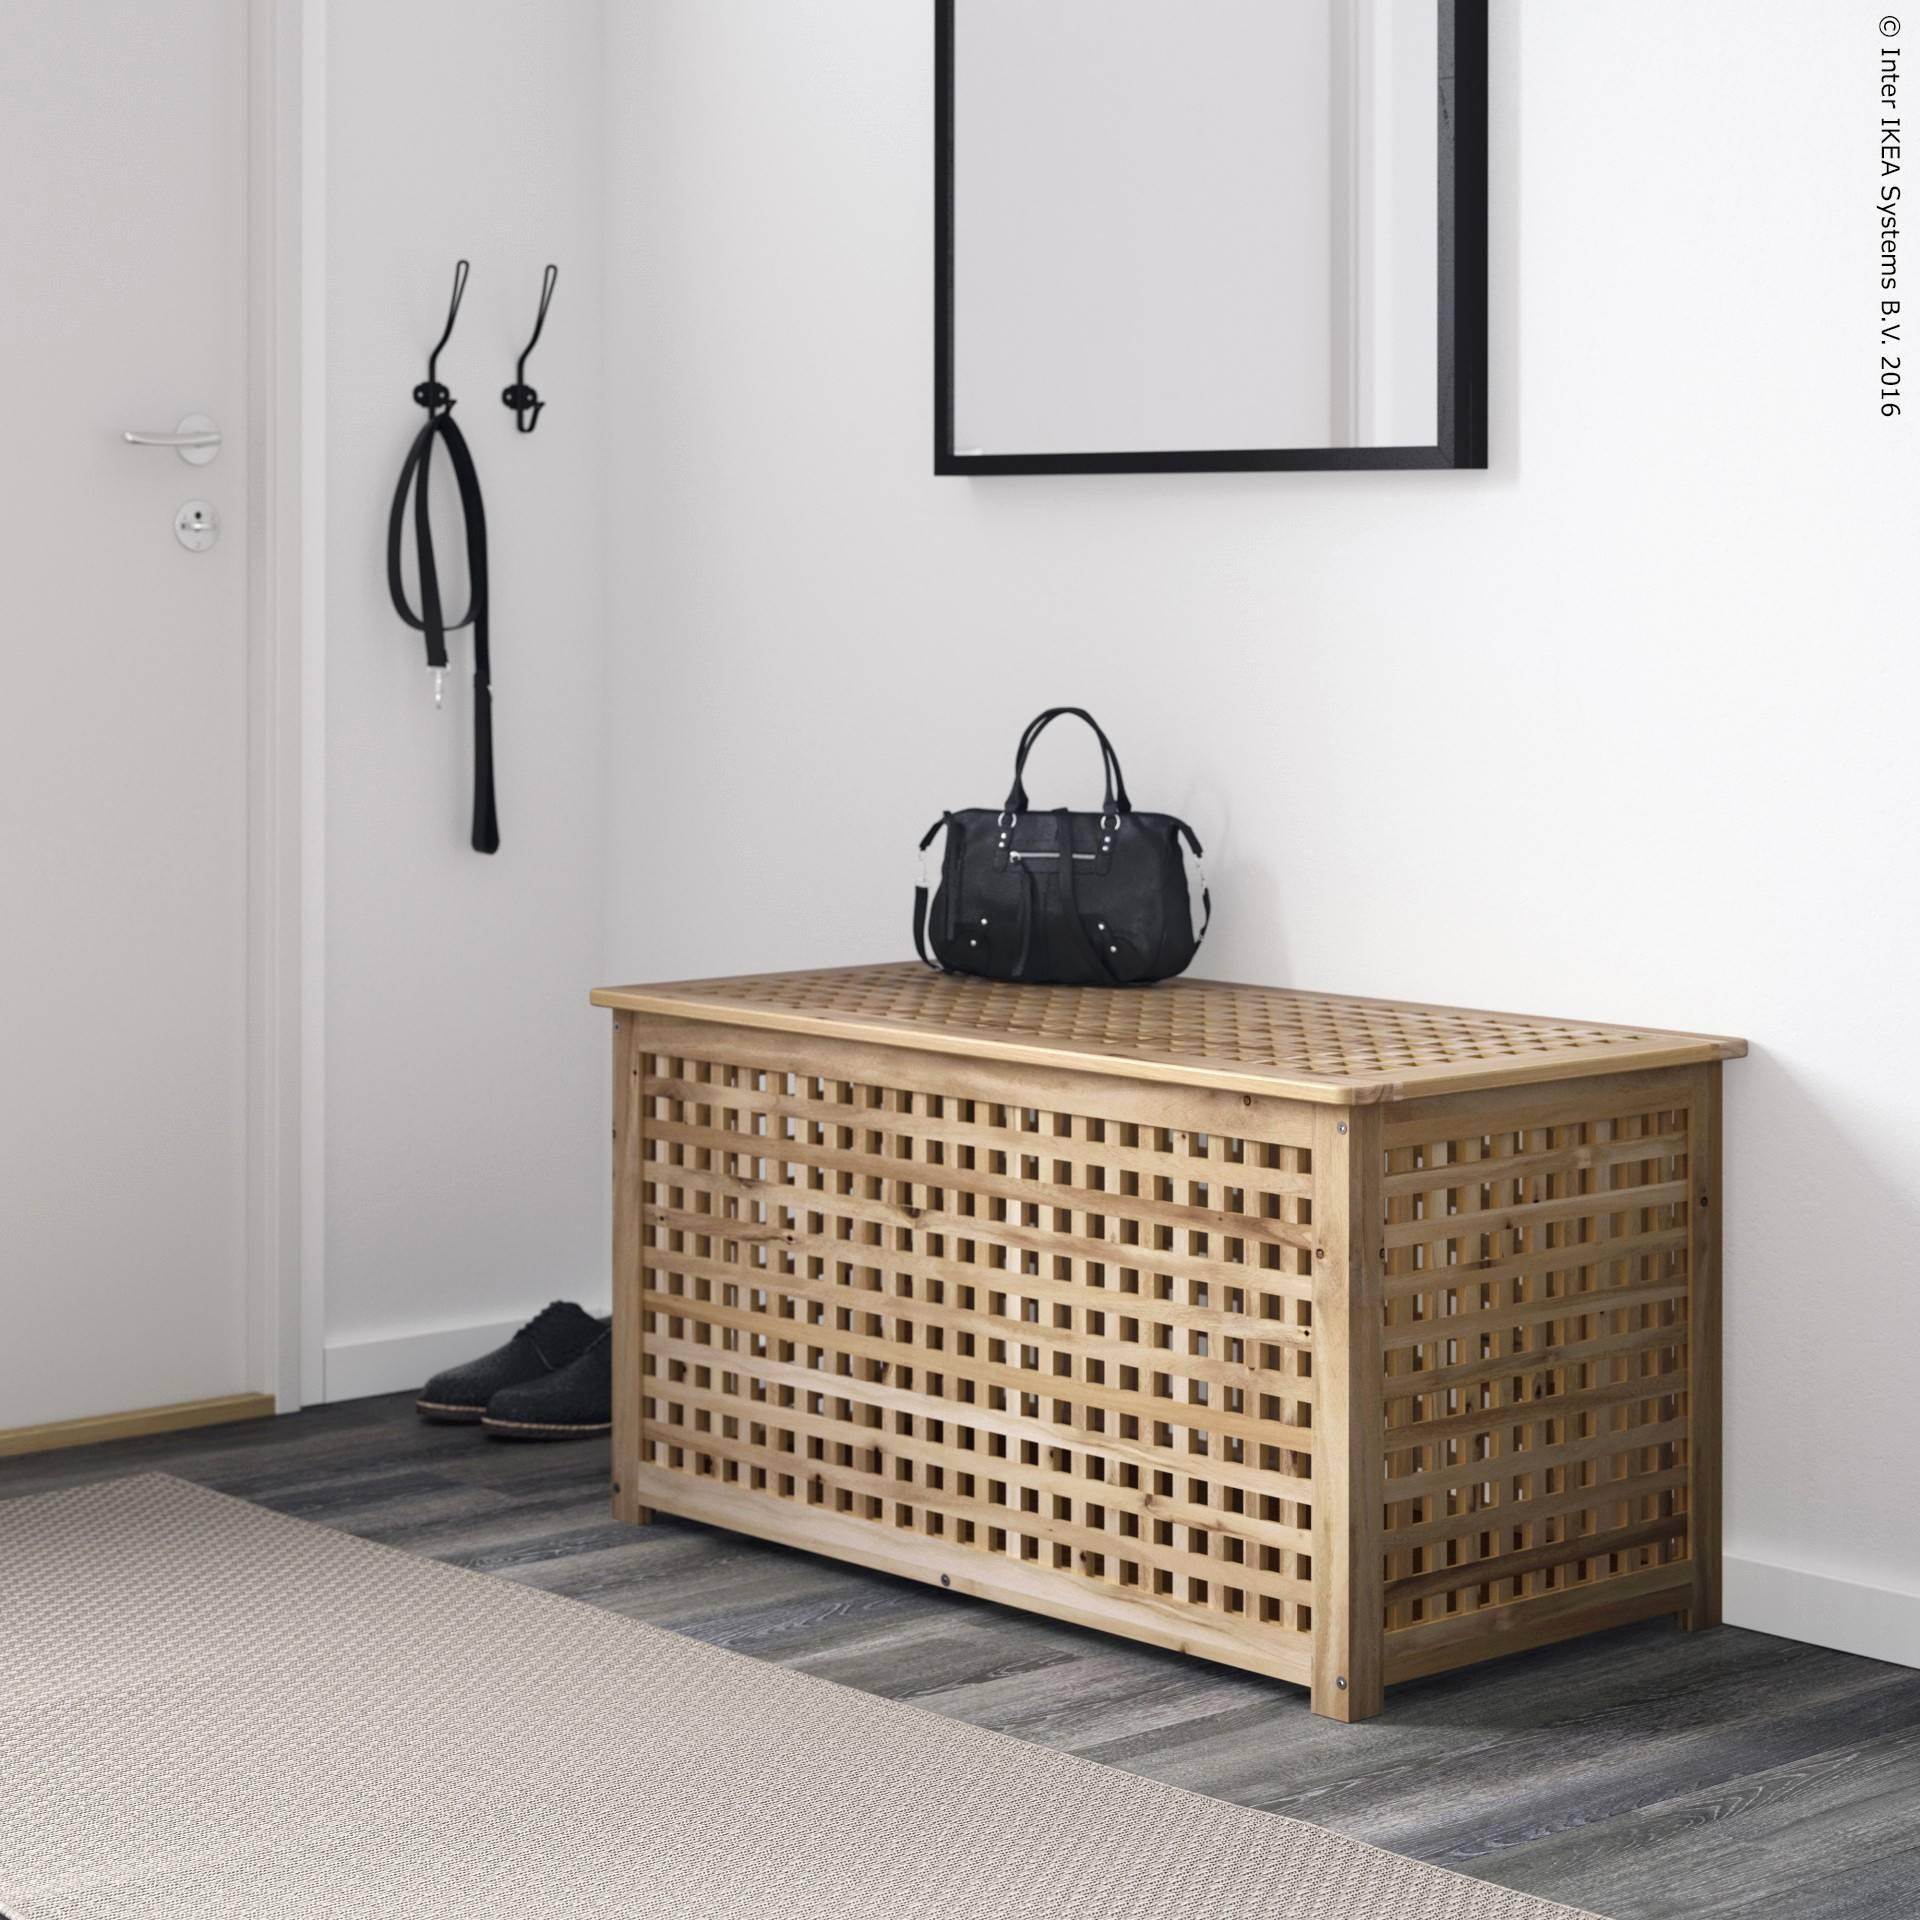 Meuble Ikea Varde Élégant Image Meuble Ikea Varde Best Ikea Varde Kitchen Sink Cabinet New Perfect